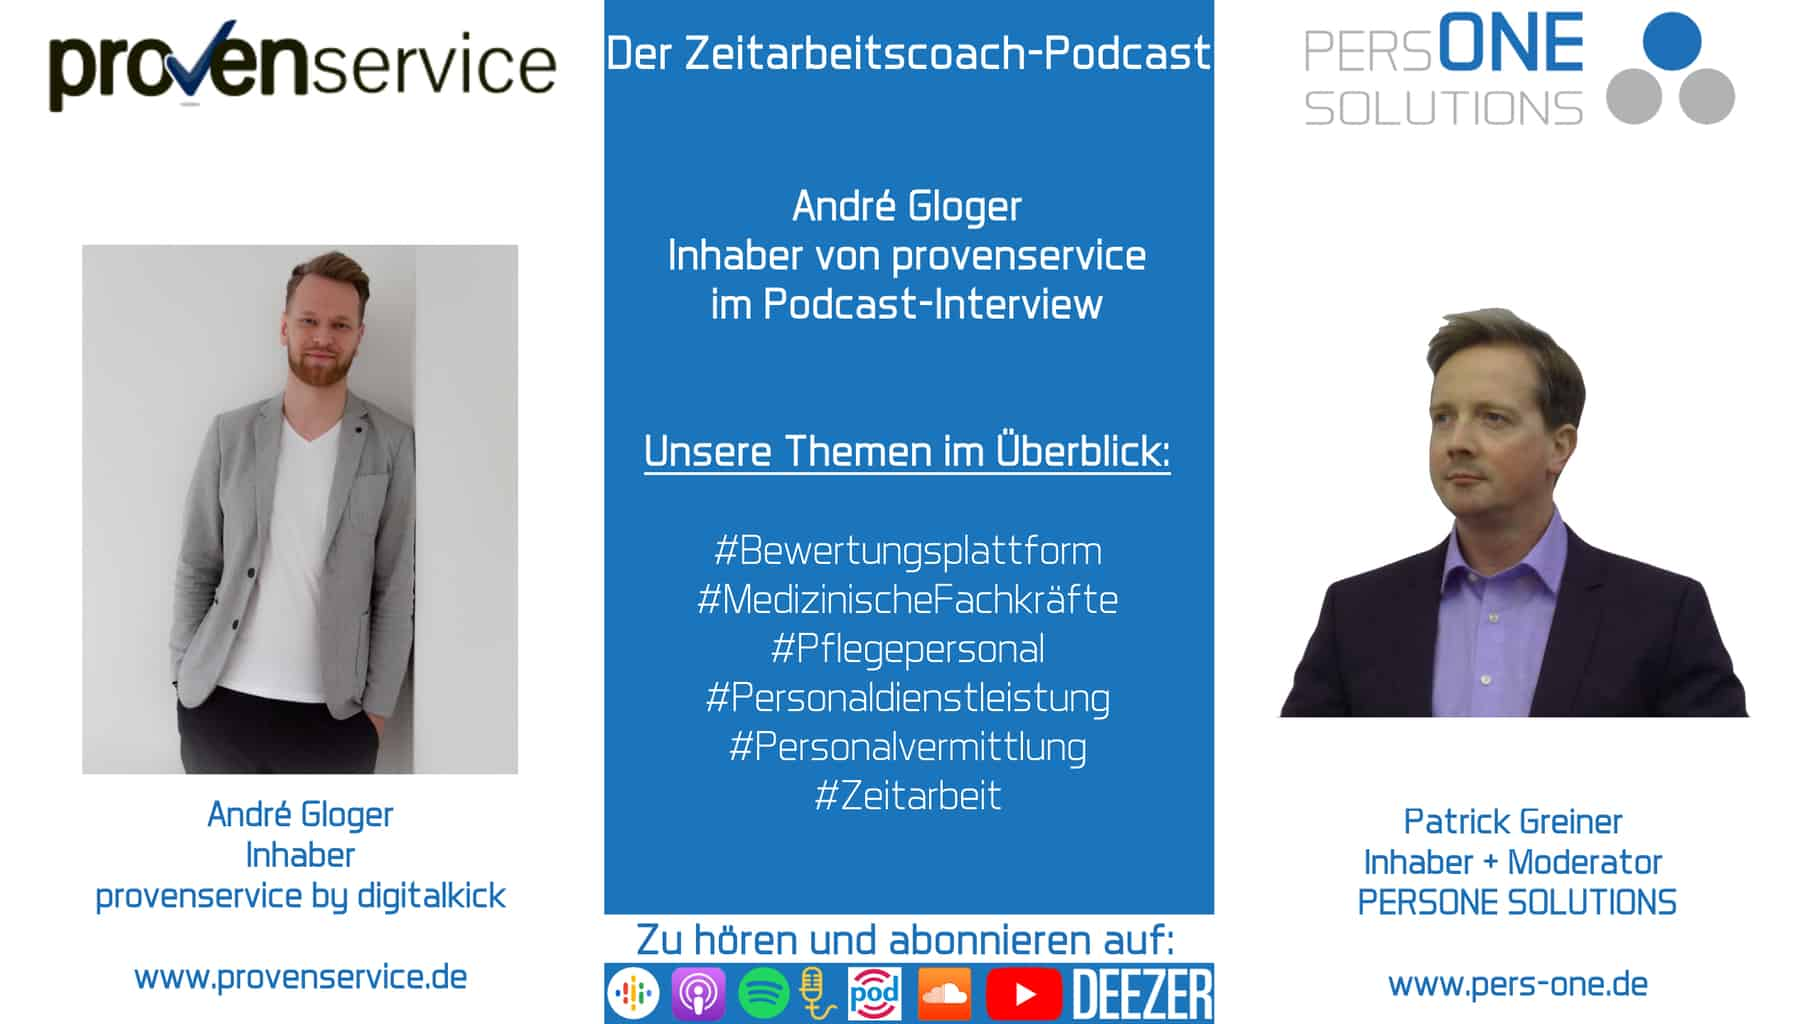 André Gloger_provenservice_Der Zeitarbeitscoach-Podcast